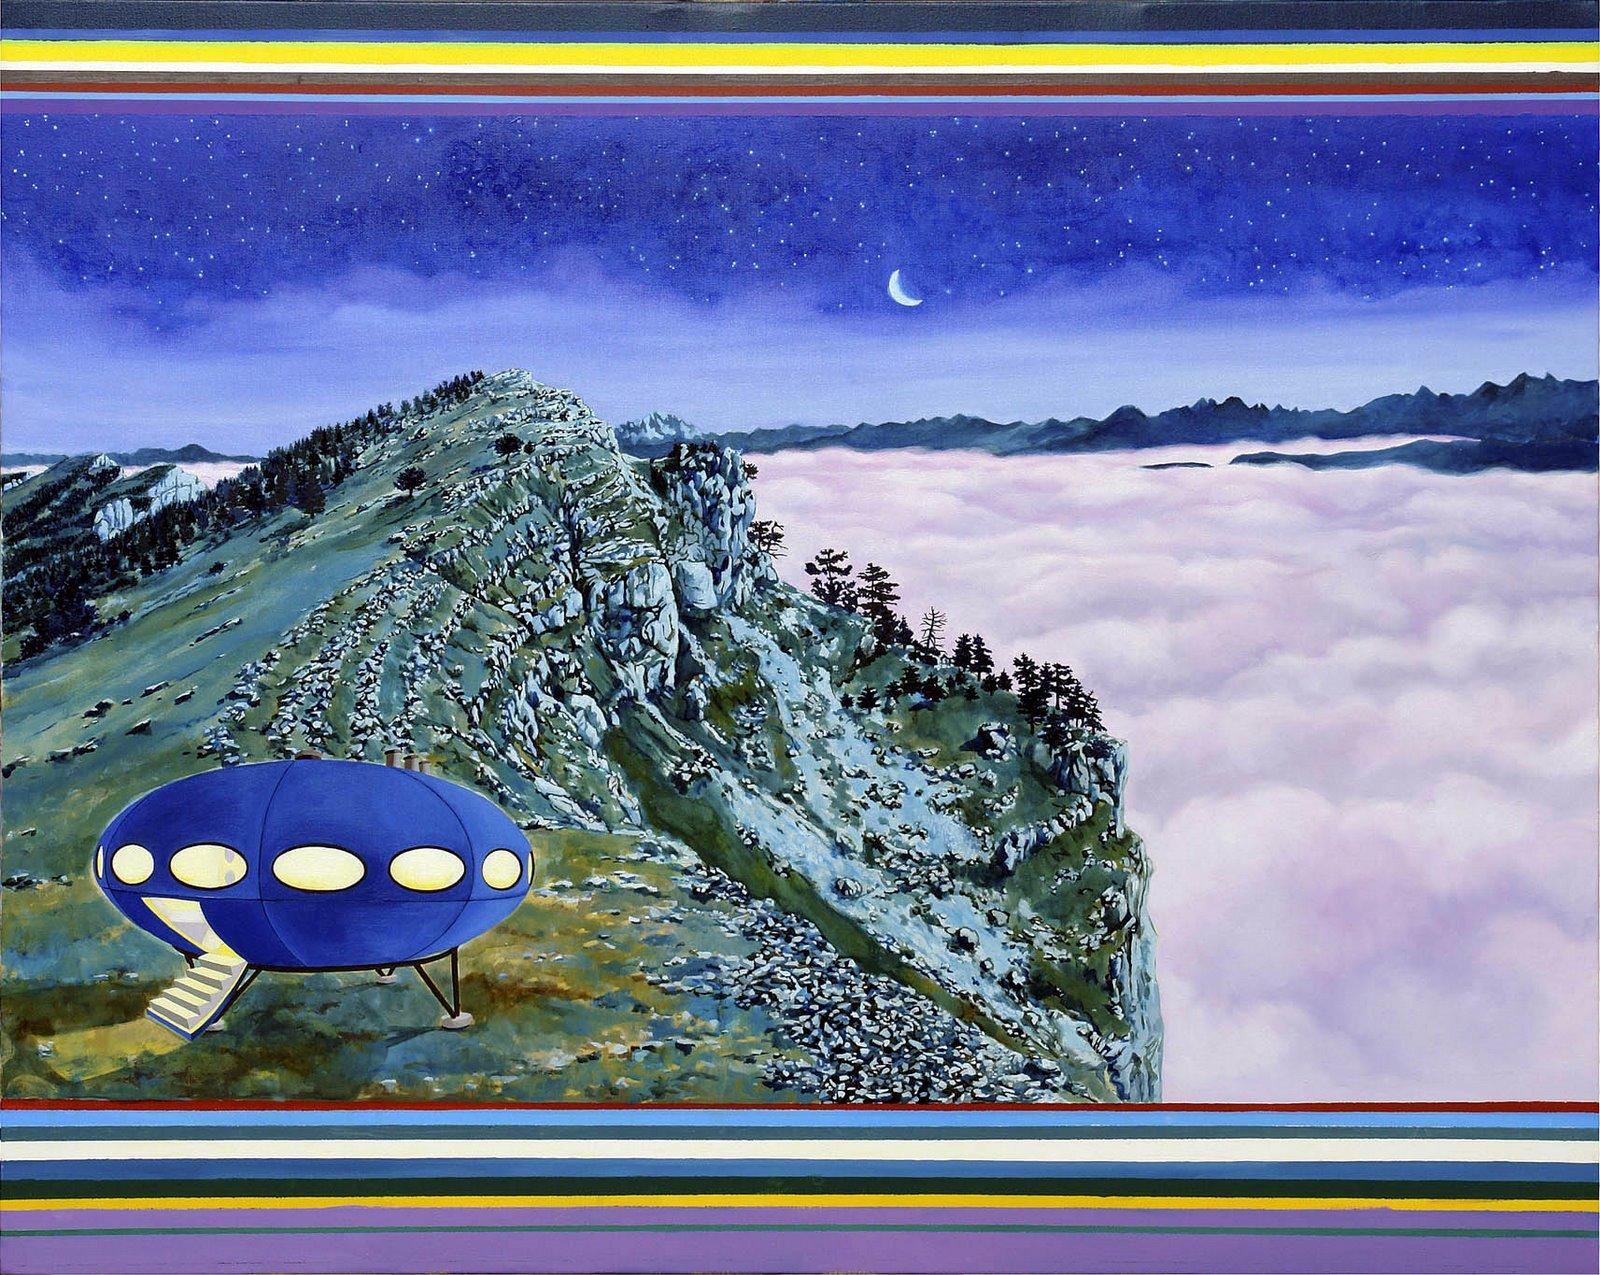 Futuro Painting - Alain Fraboni